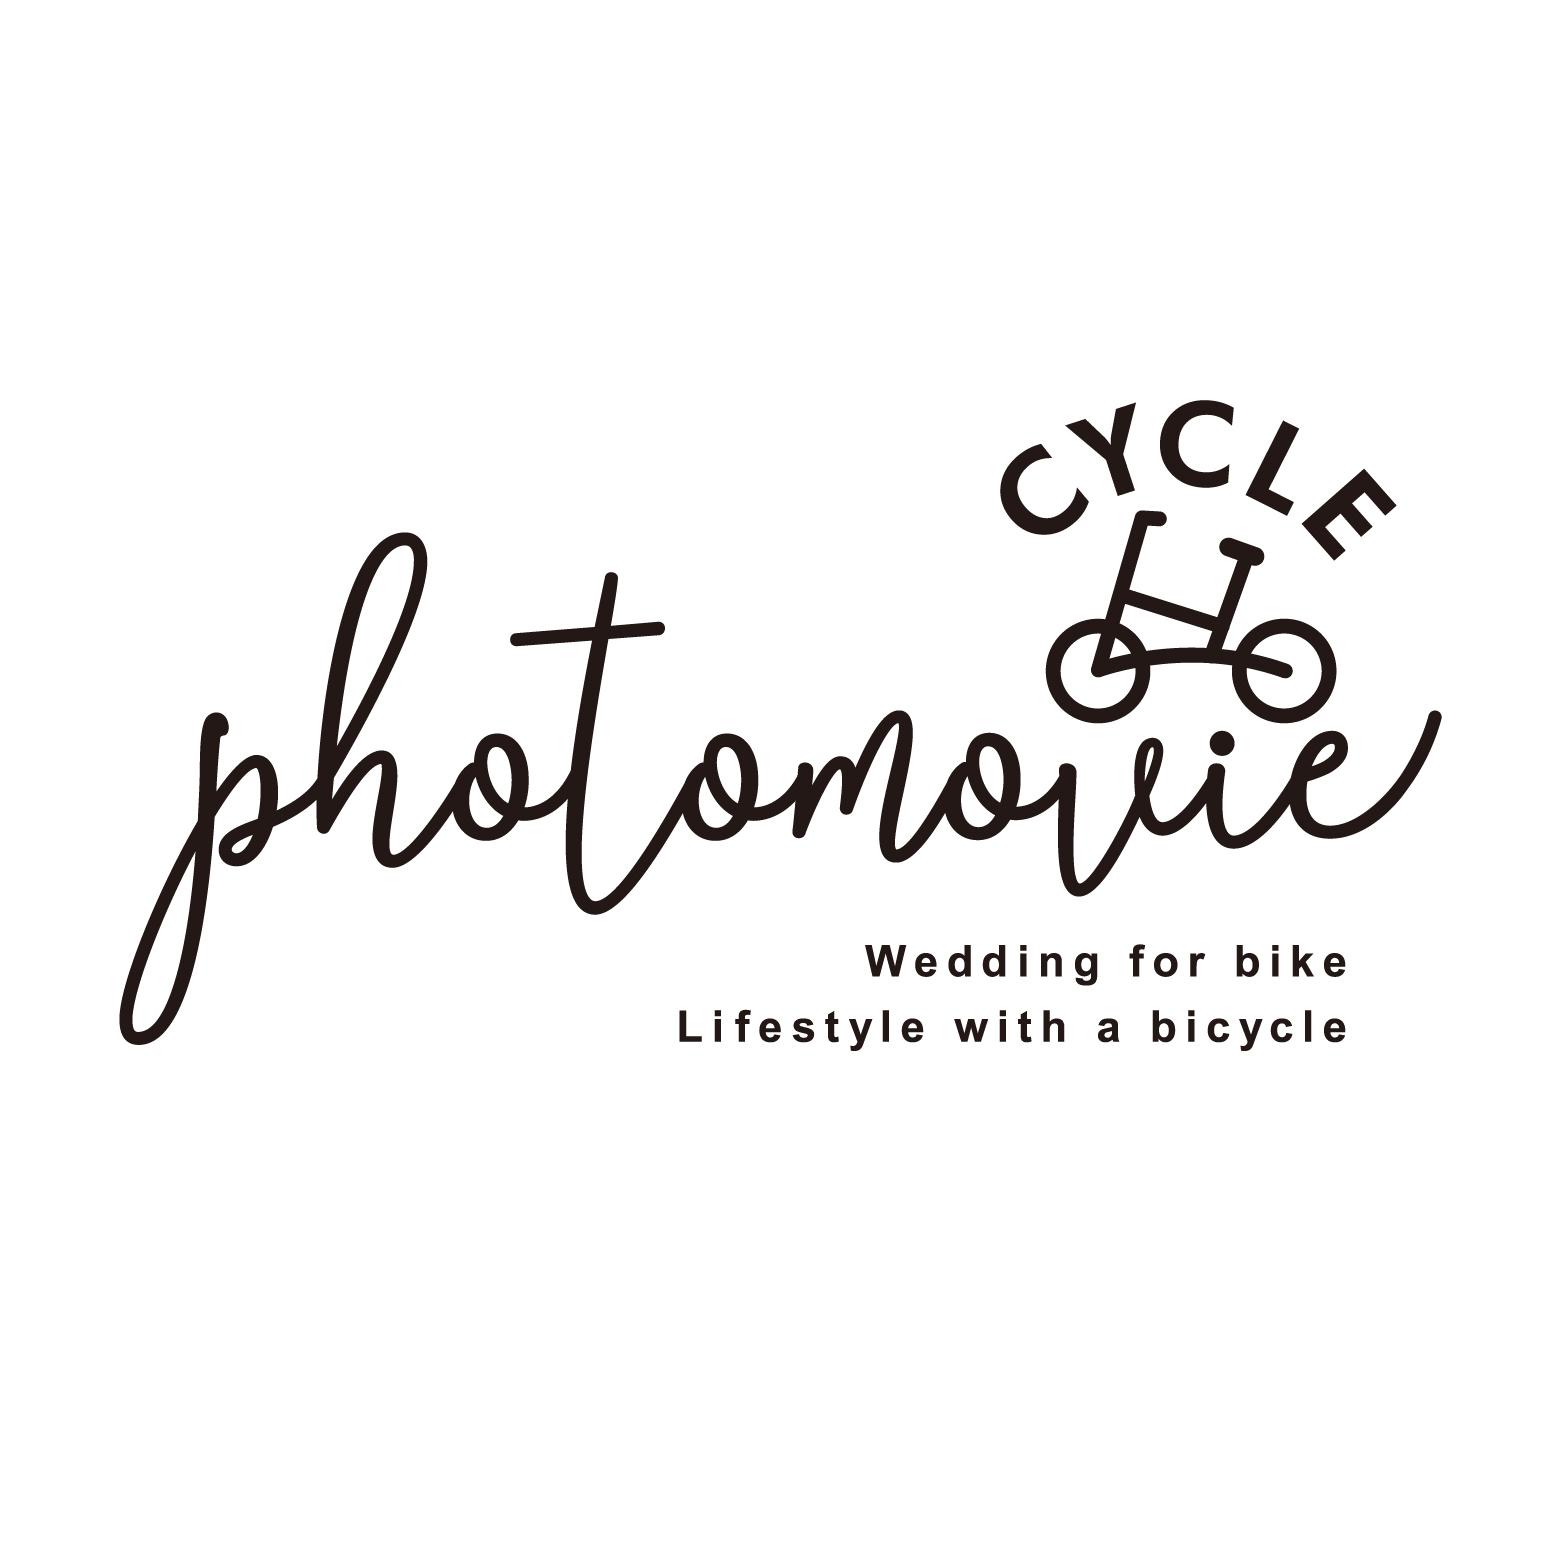 Cycle photomovie